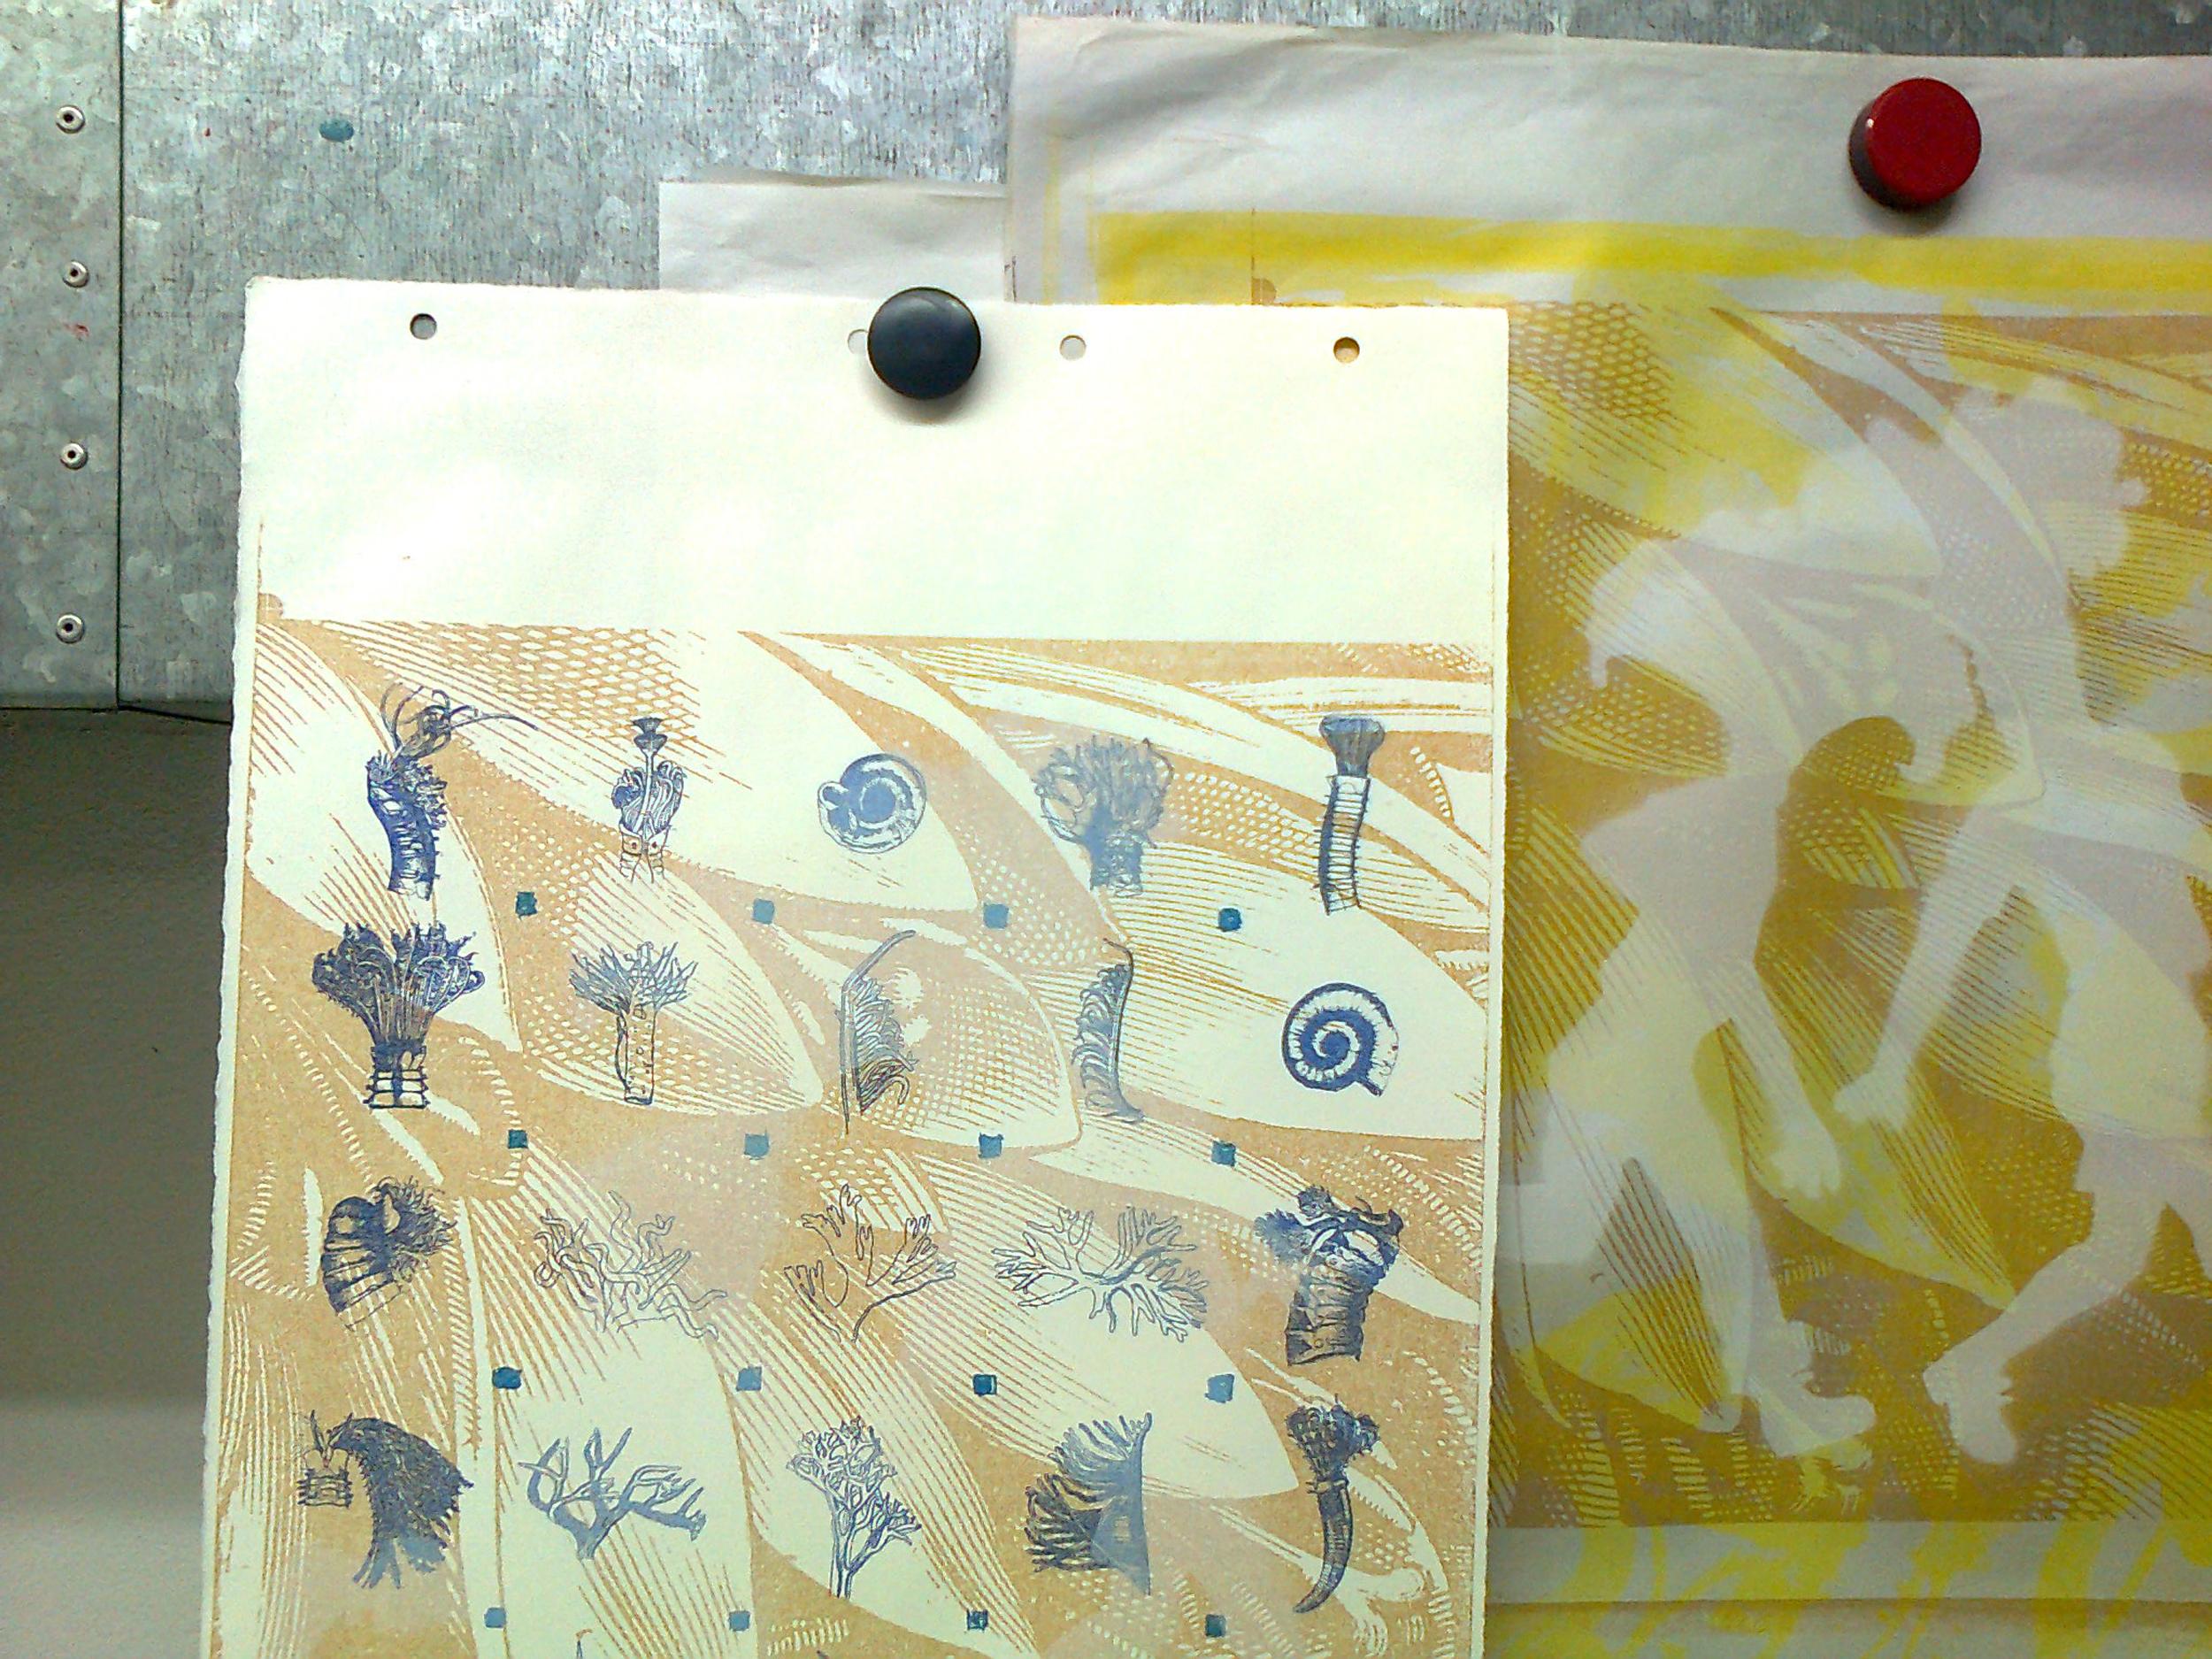 testimonial-i-iii-iii-progress-documentation-cellphone-sketchbook-030.jpg